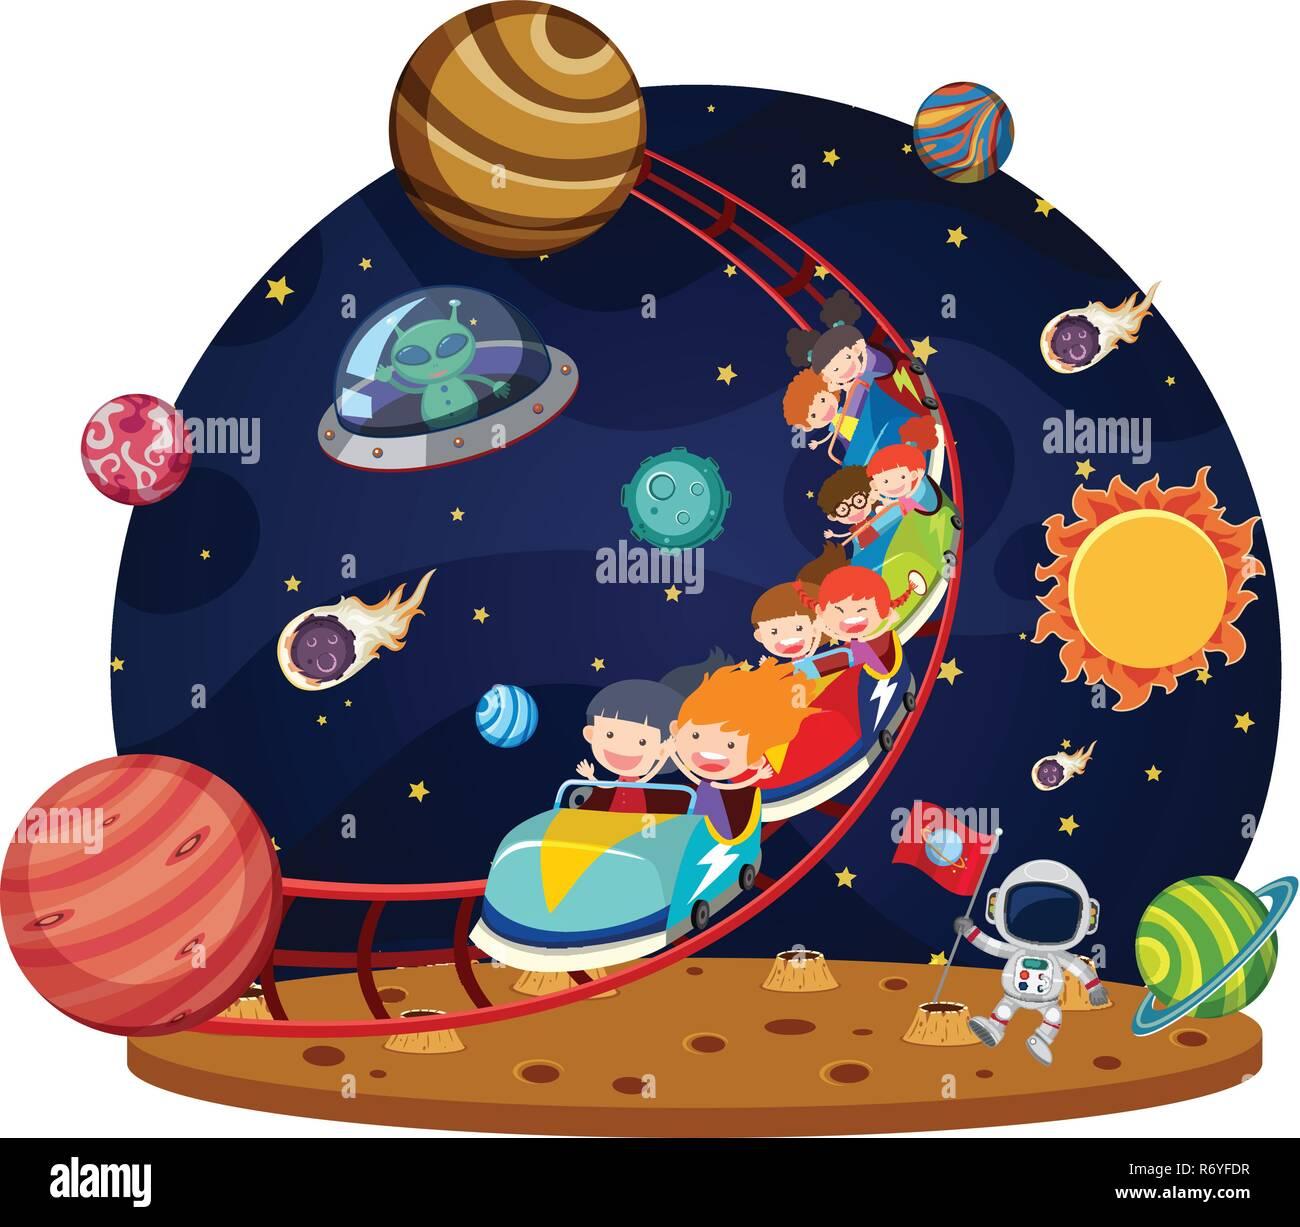 Children riding space roller coaster illustration - Stock Vector